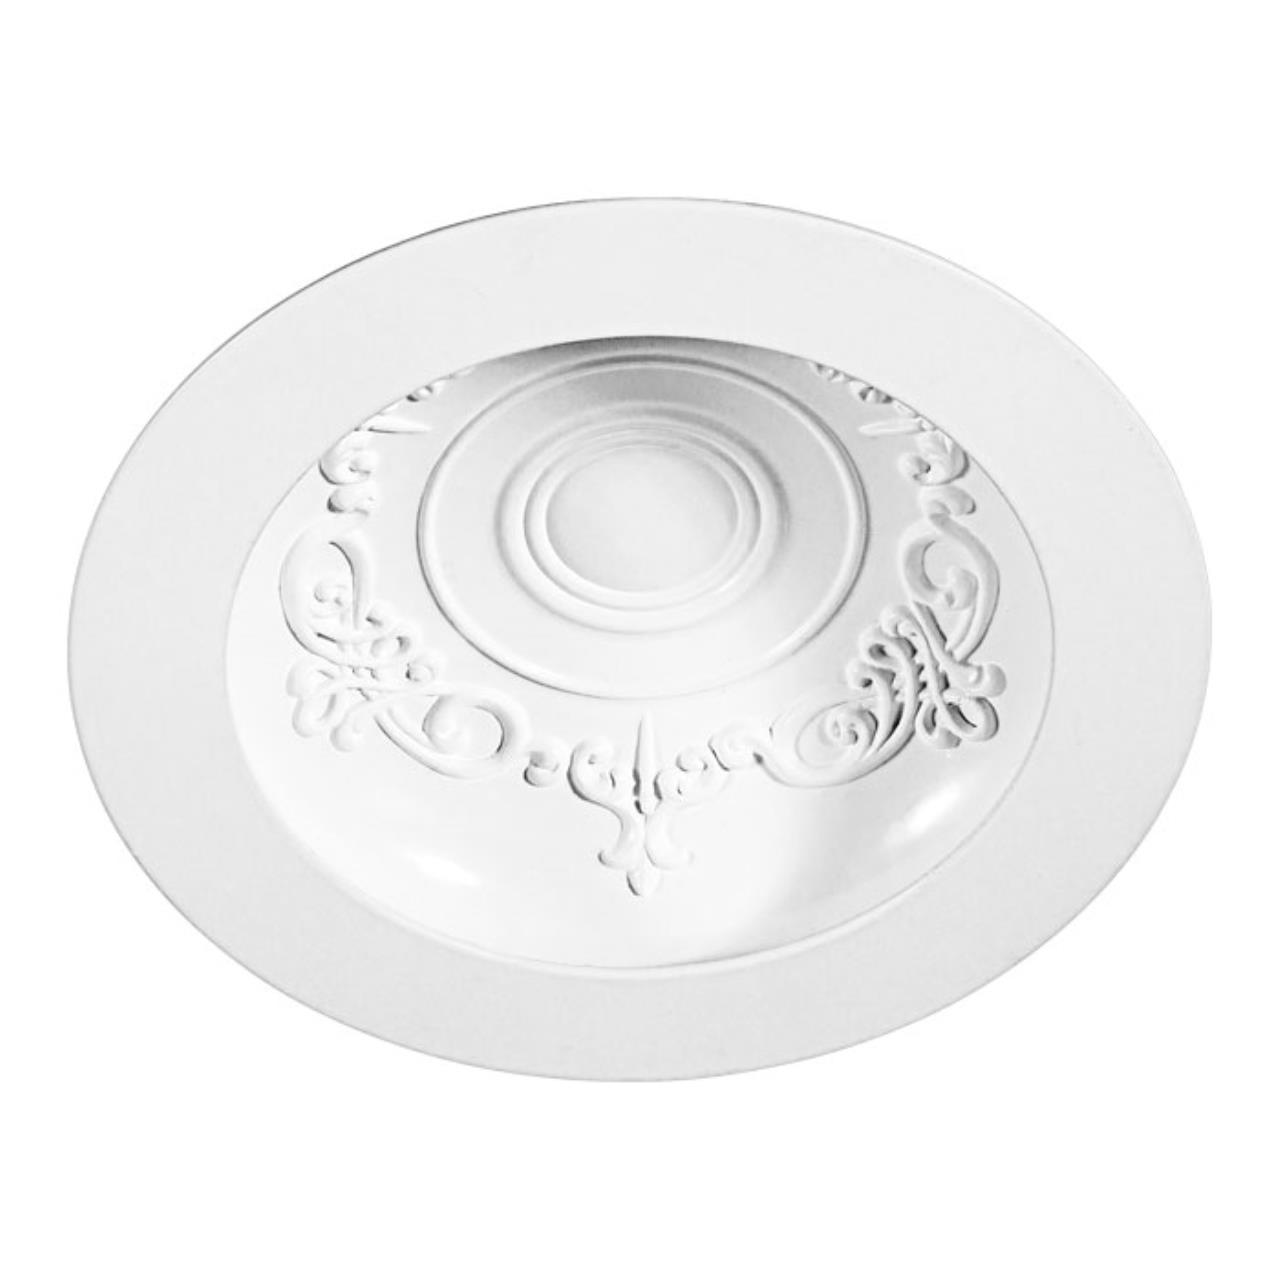 357355 SPOT NT17 141 белый Встраиваемый светильник IP20 LED 3000K 7W 85-265V GESSO